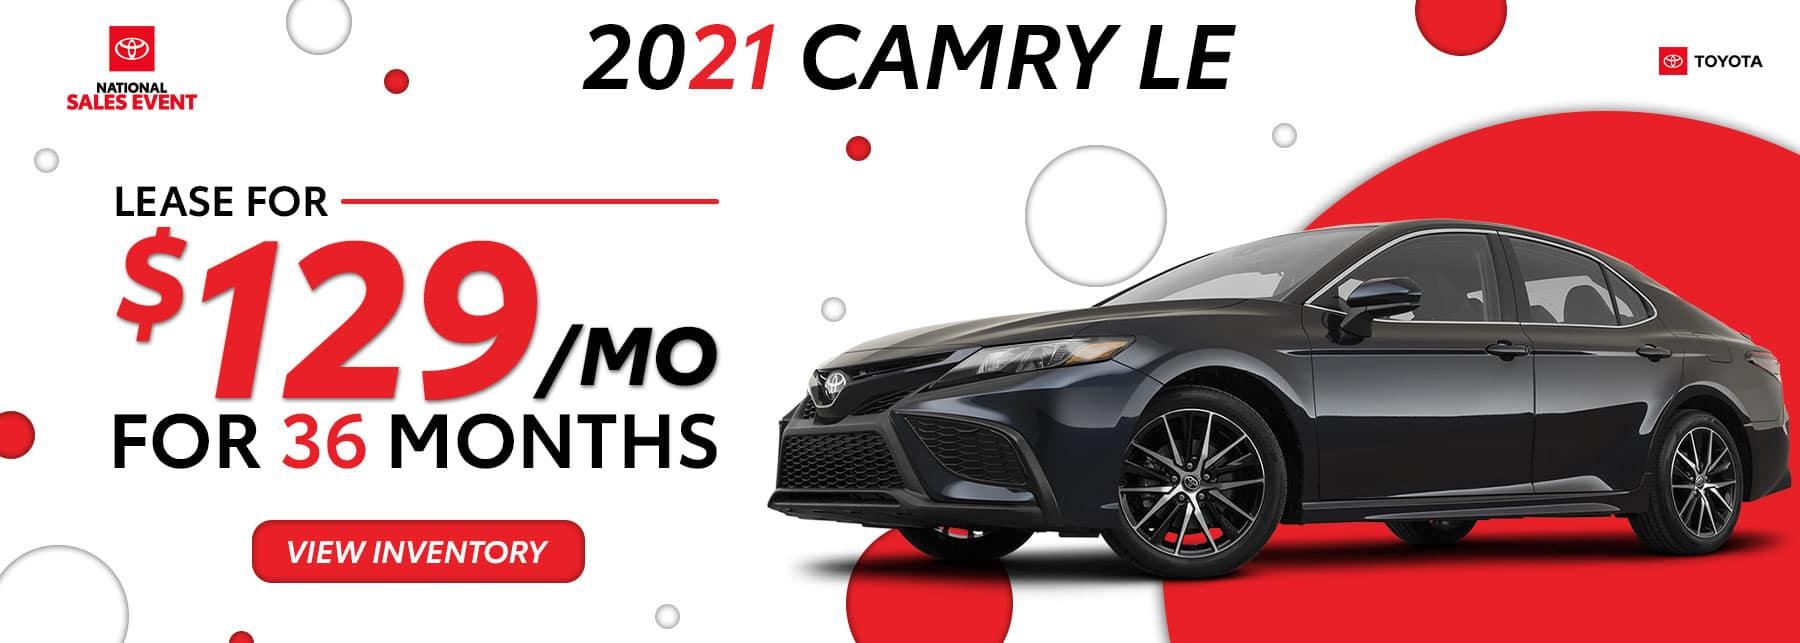 Toyota of North Miami – June 21 – 21 Camry – 1800×643